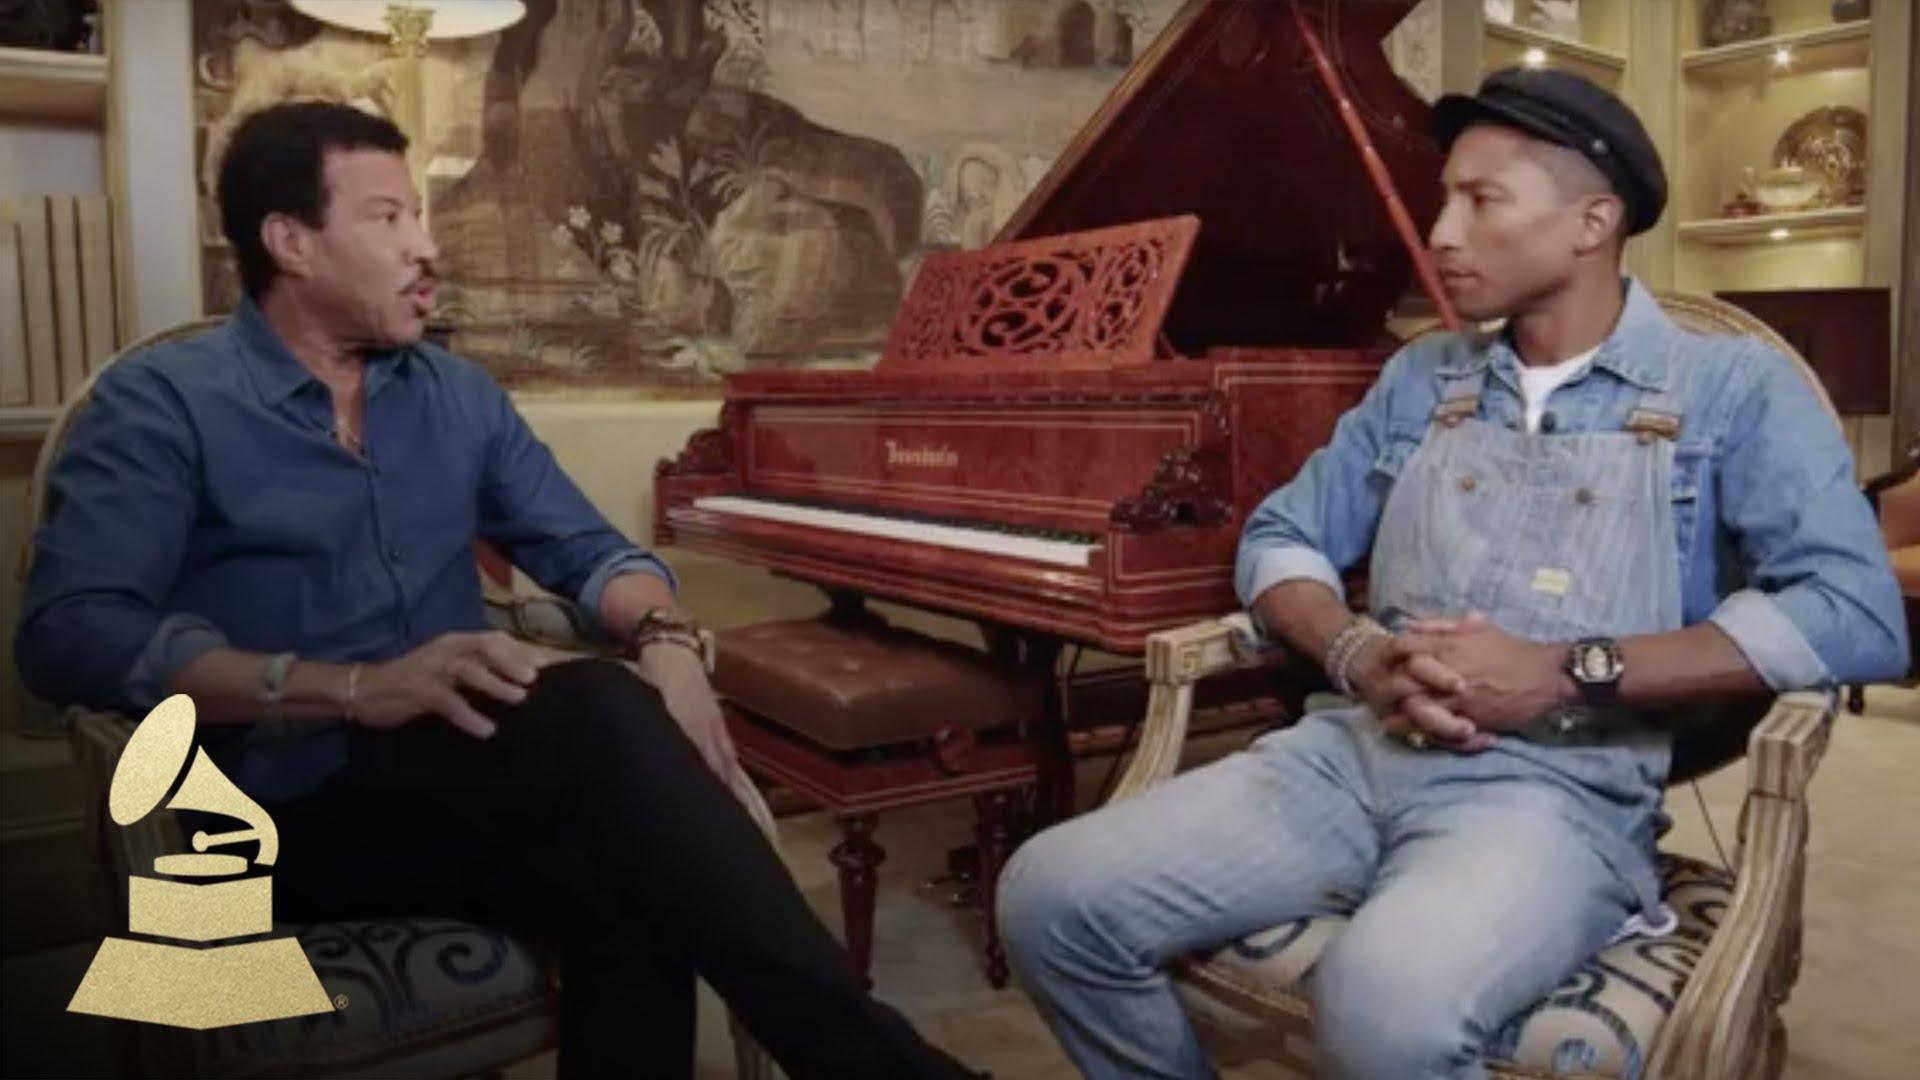 Watch The Grammys Season  - Lionel Richie and Pharrell Williams Interview | 58th GRAMMYs Online